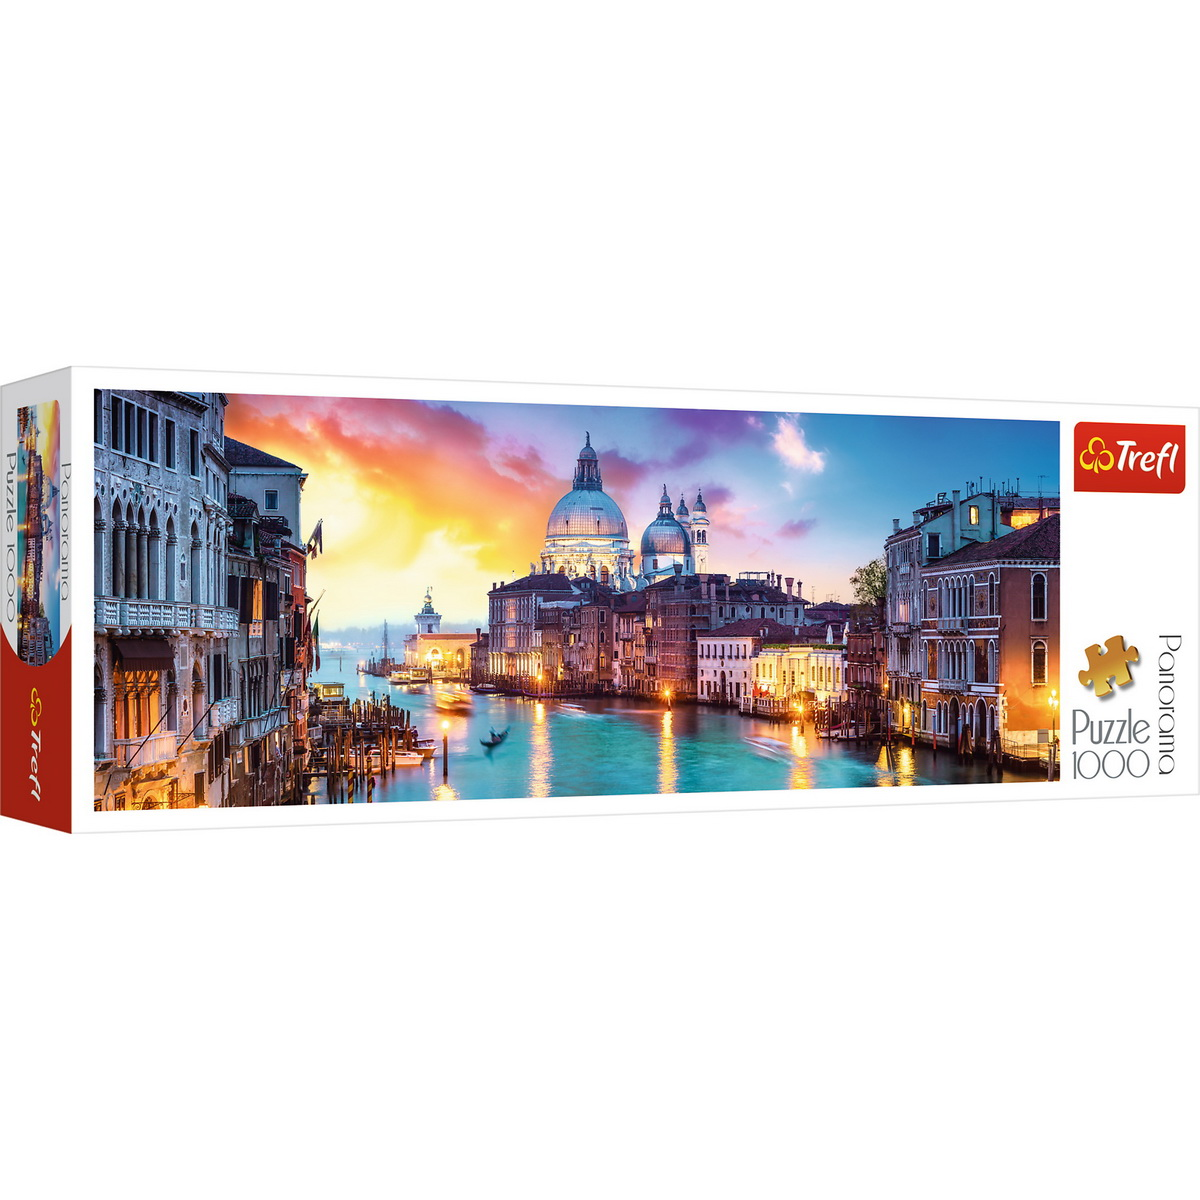 Puzzle Trefl 1000 Panorama Canal Grande Venetia